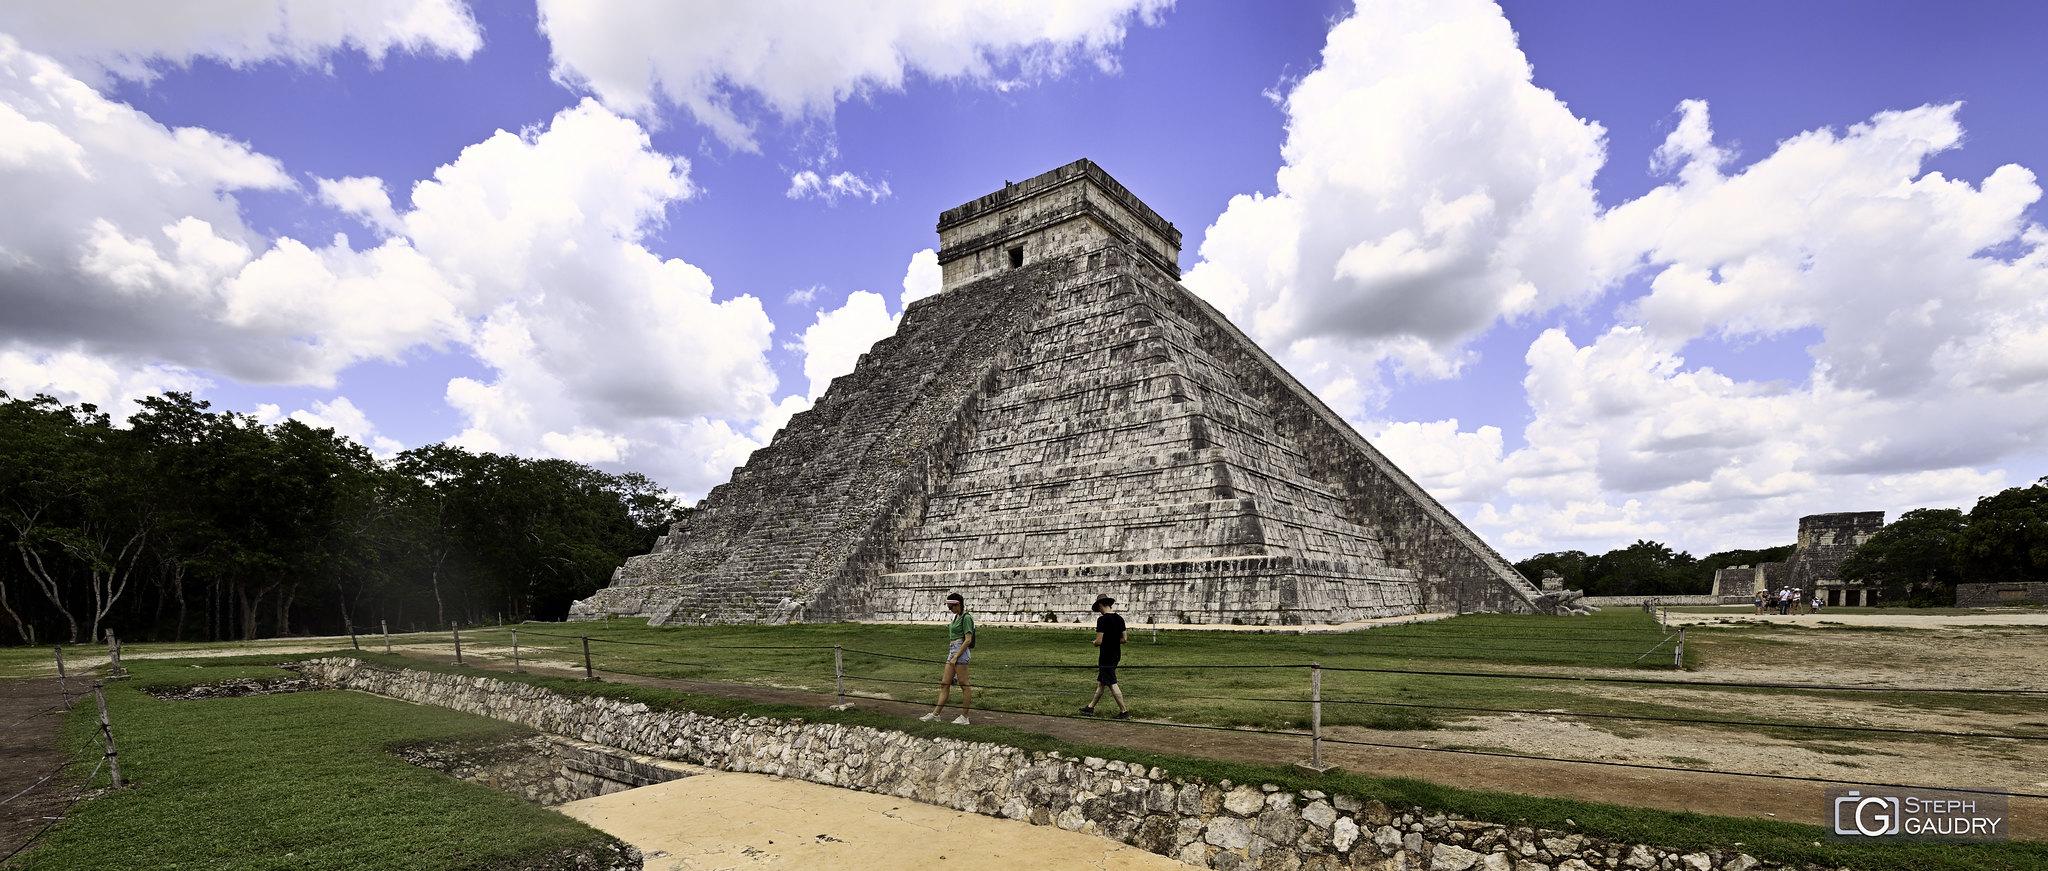 Chichén Itzá - El Castillo (pyramide de Kukulcán) - ciné [Click to start slideshow]